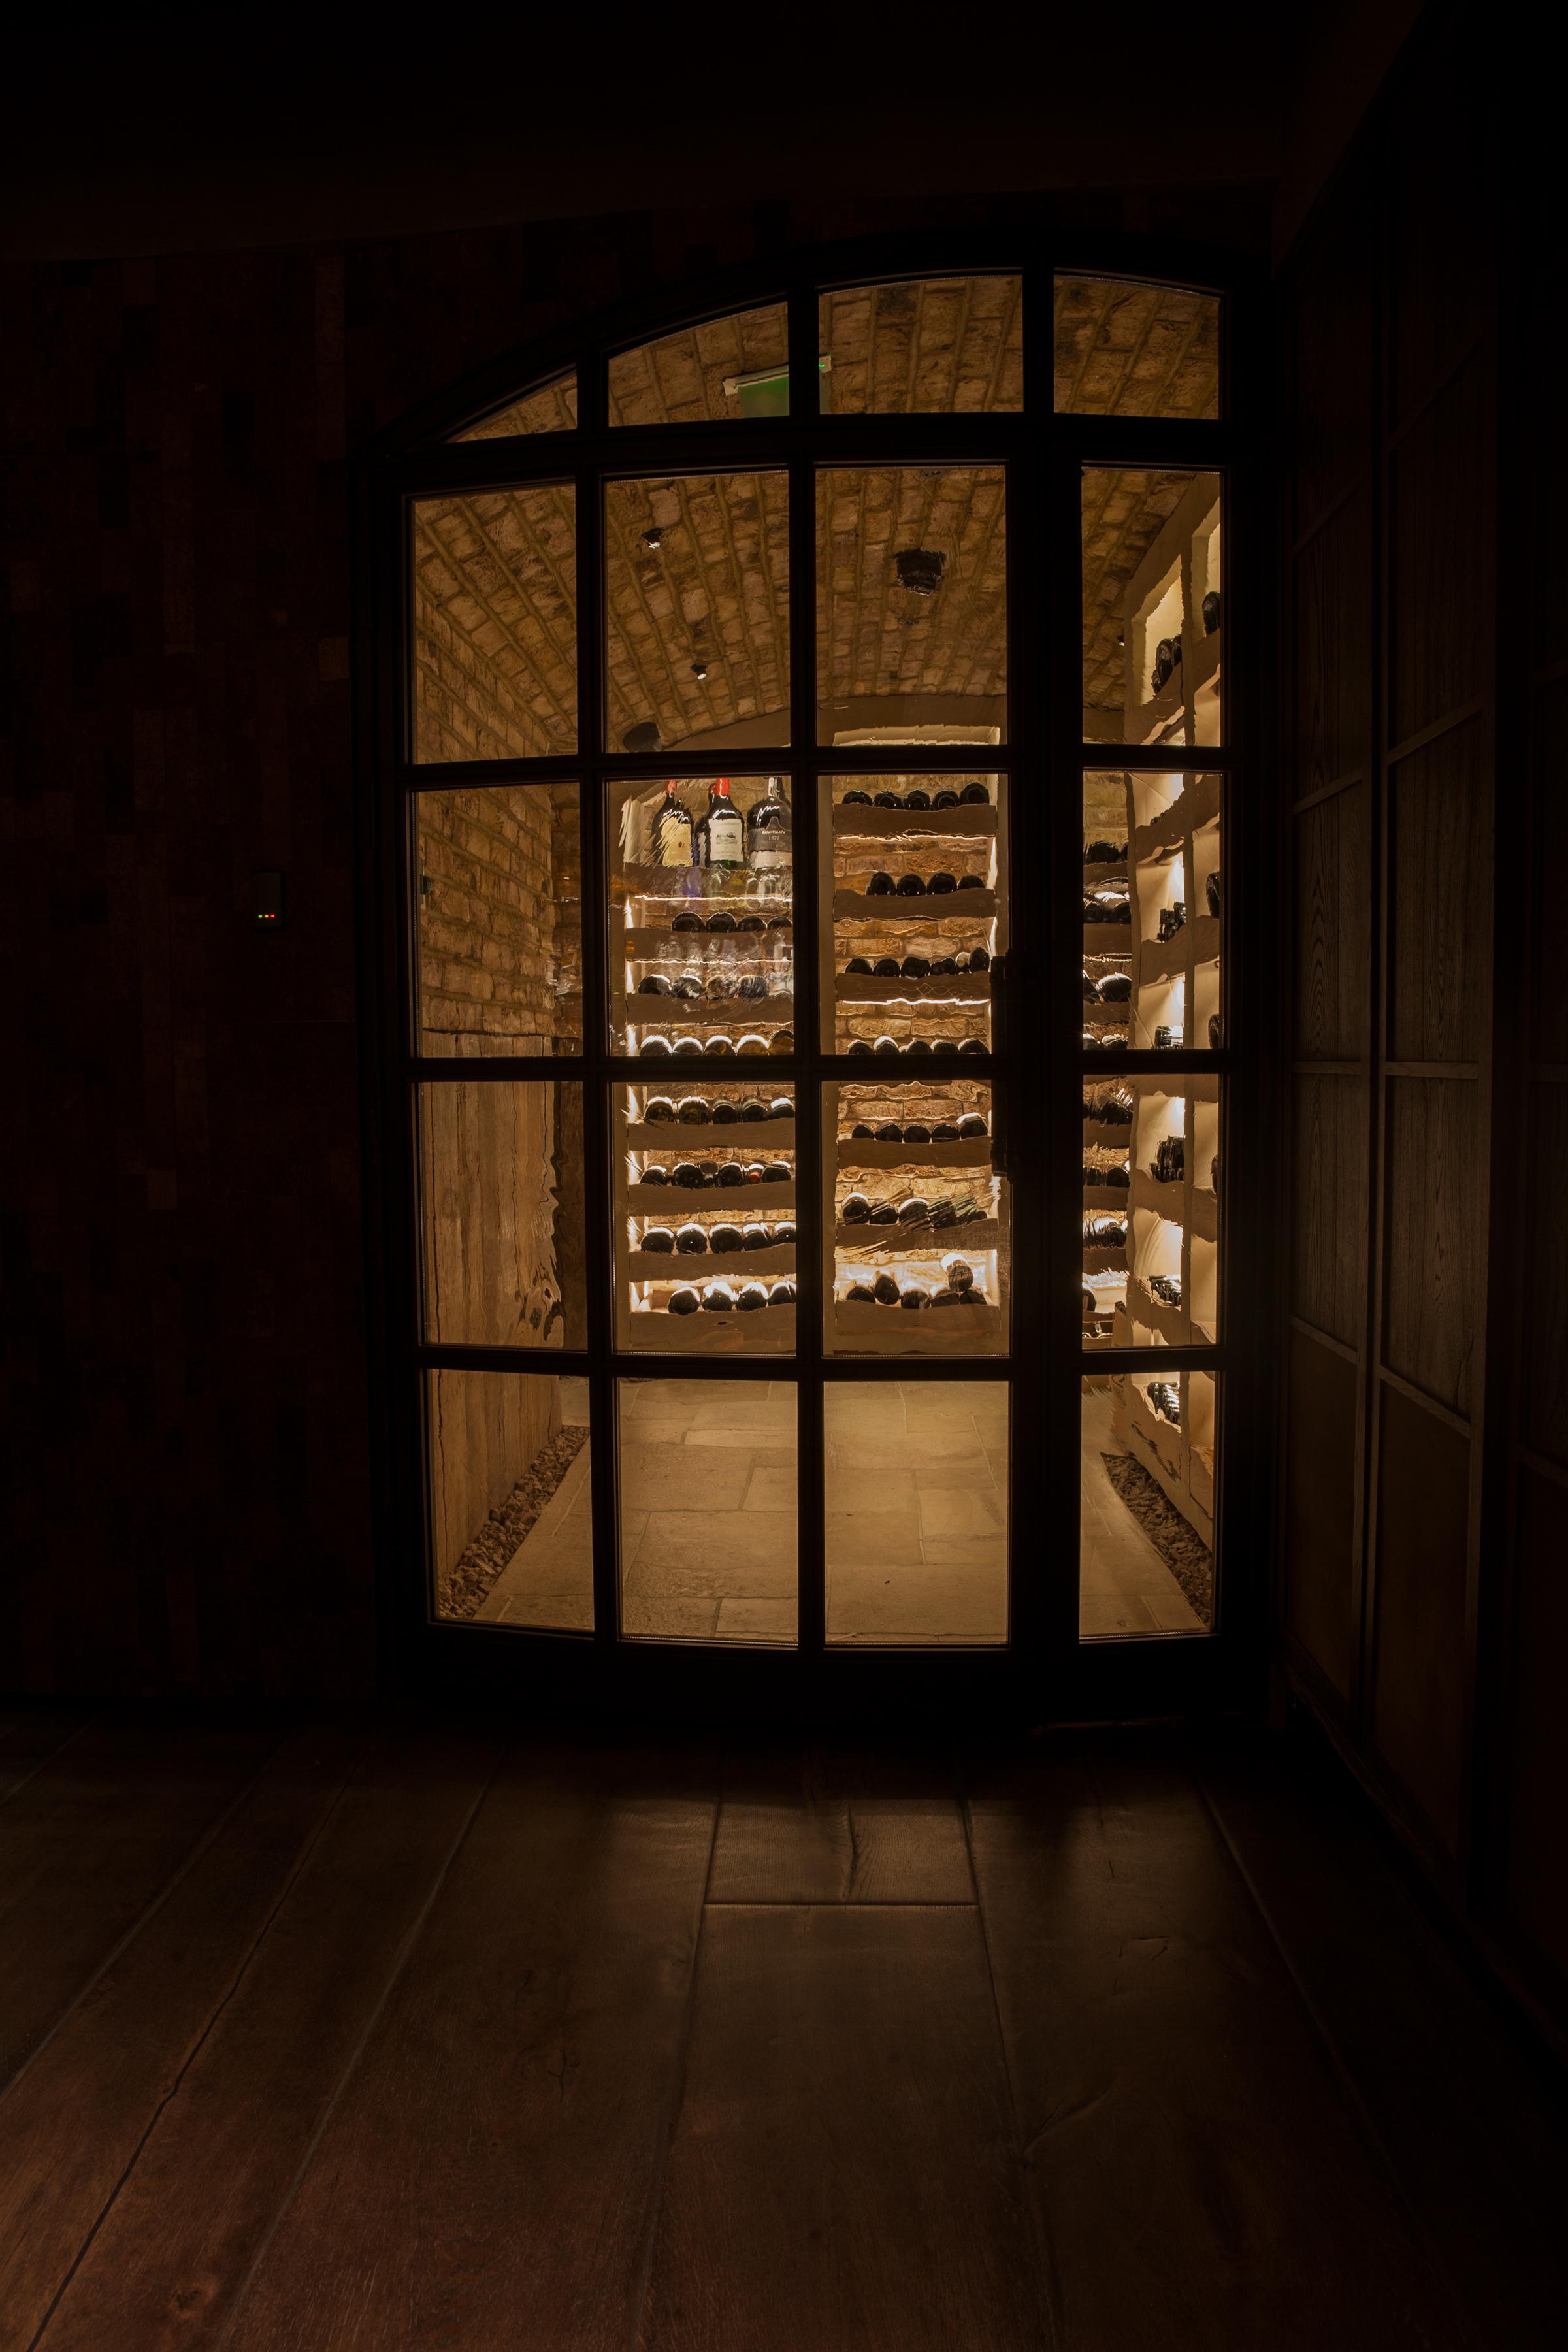 Wine Vaults Design These White Walls Studio Interior Design Hide Restaurant London.jpg